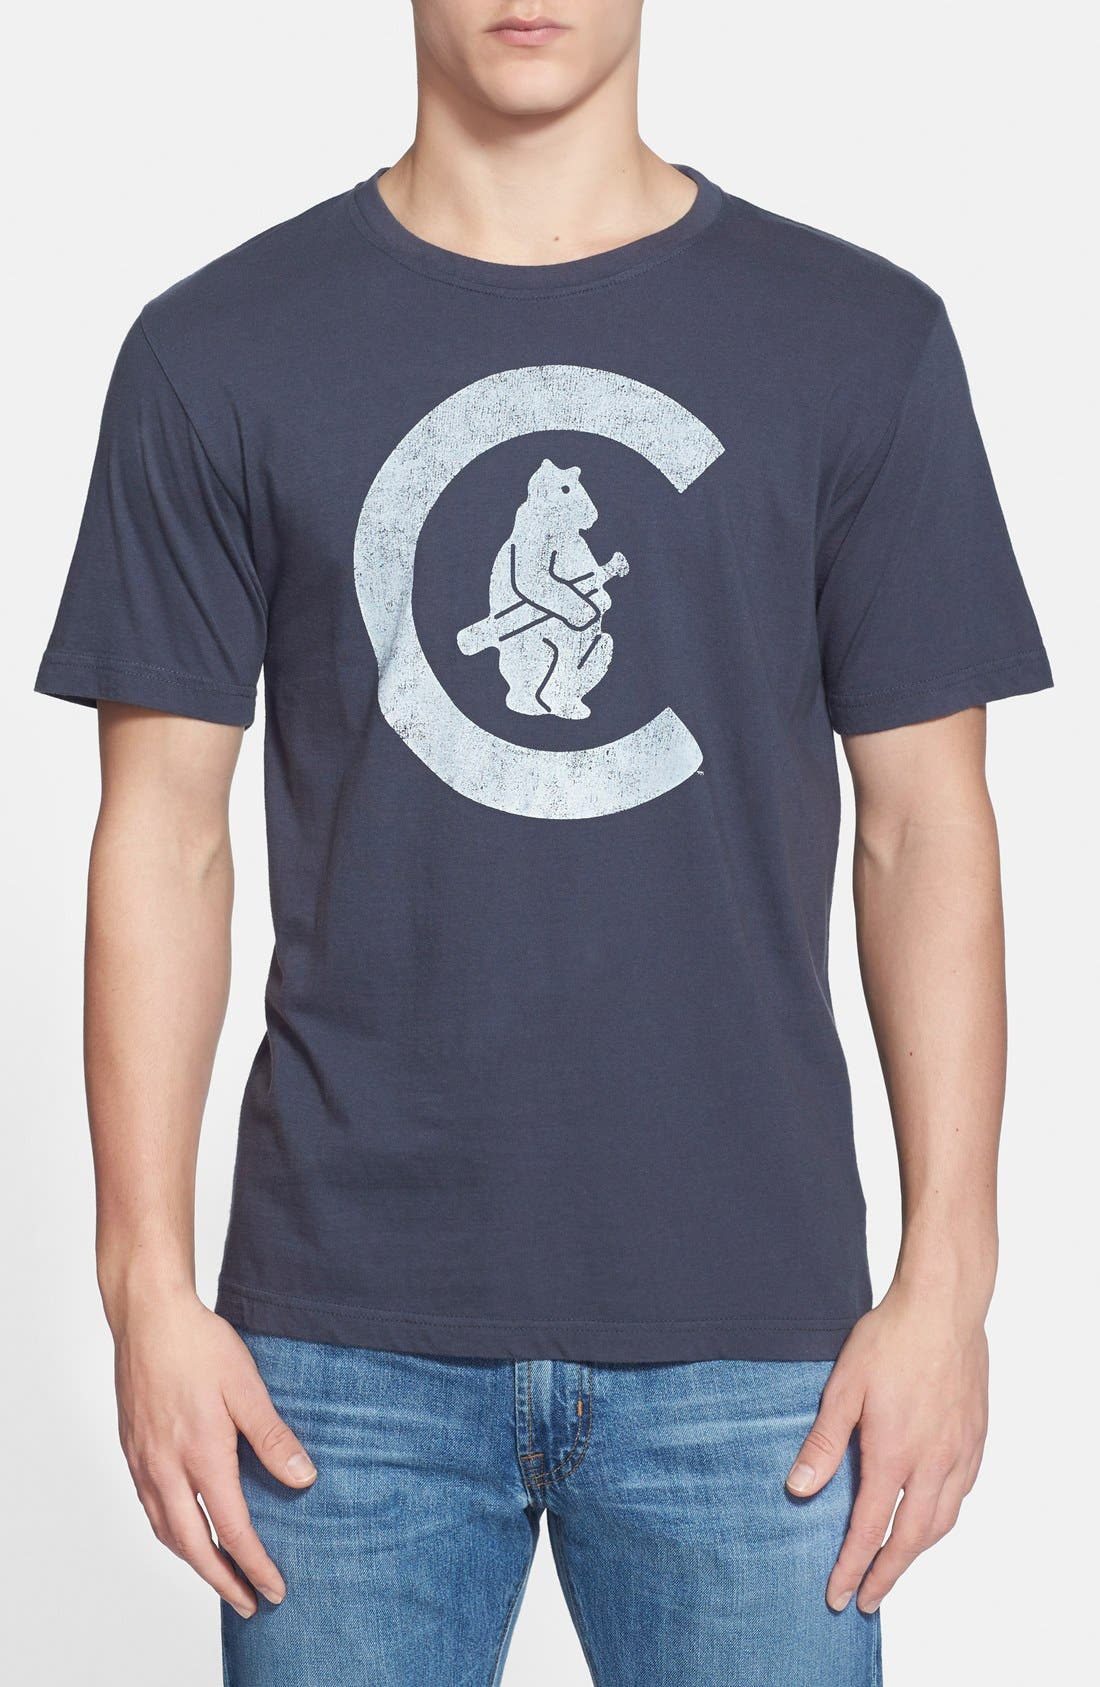 Red Jacket 'Chicago Cubs - Brass Tacks' T-Shirt